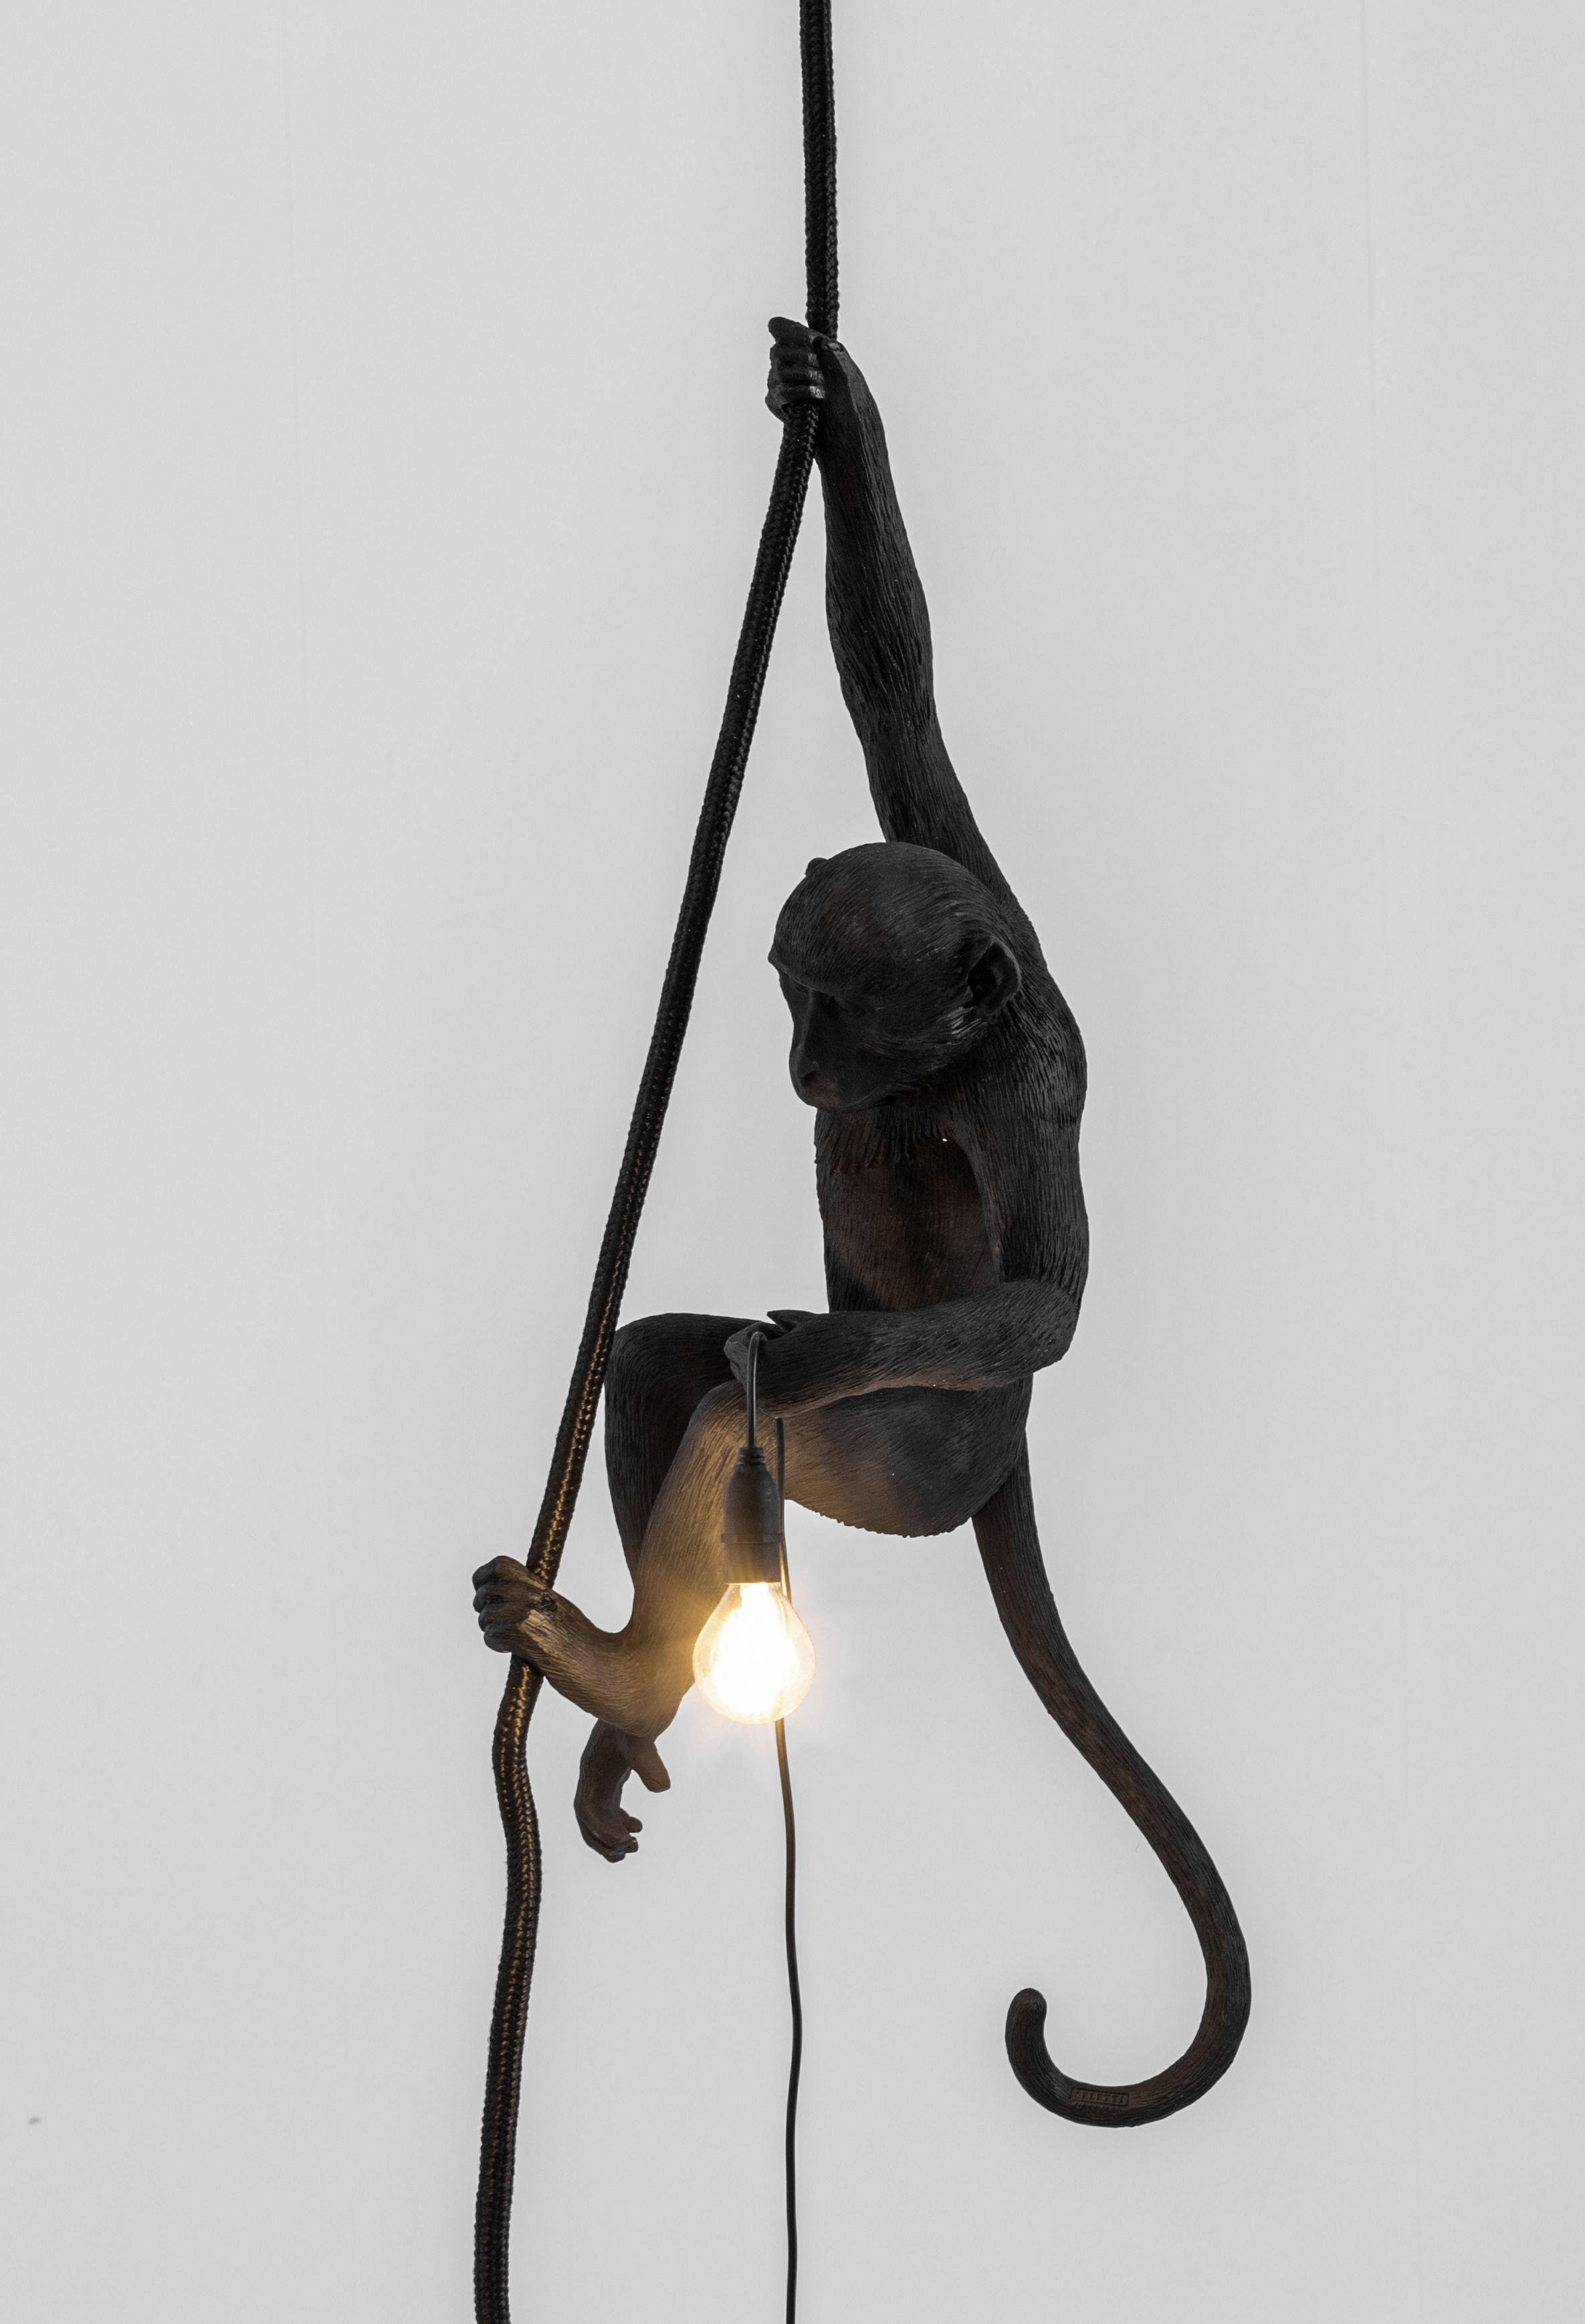 suspension monkey hanging outdoor h 80 cm noir seletti. Black Bedroom Furniture Sets. Home Design Ideas